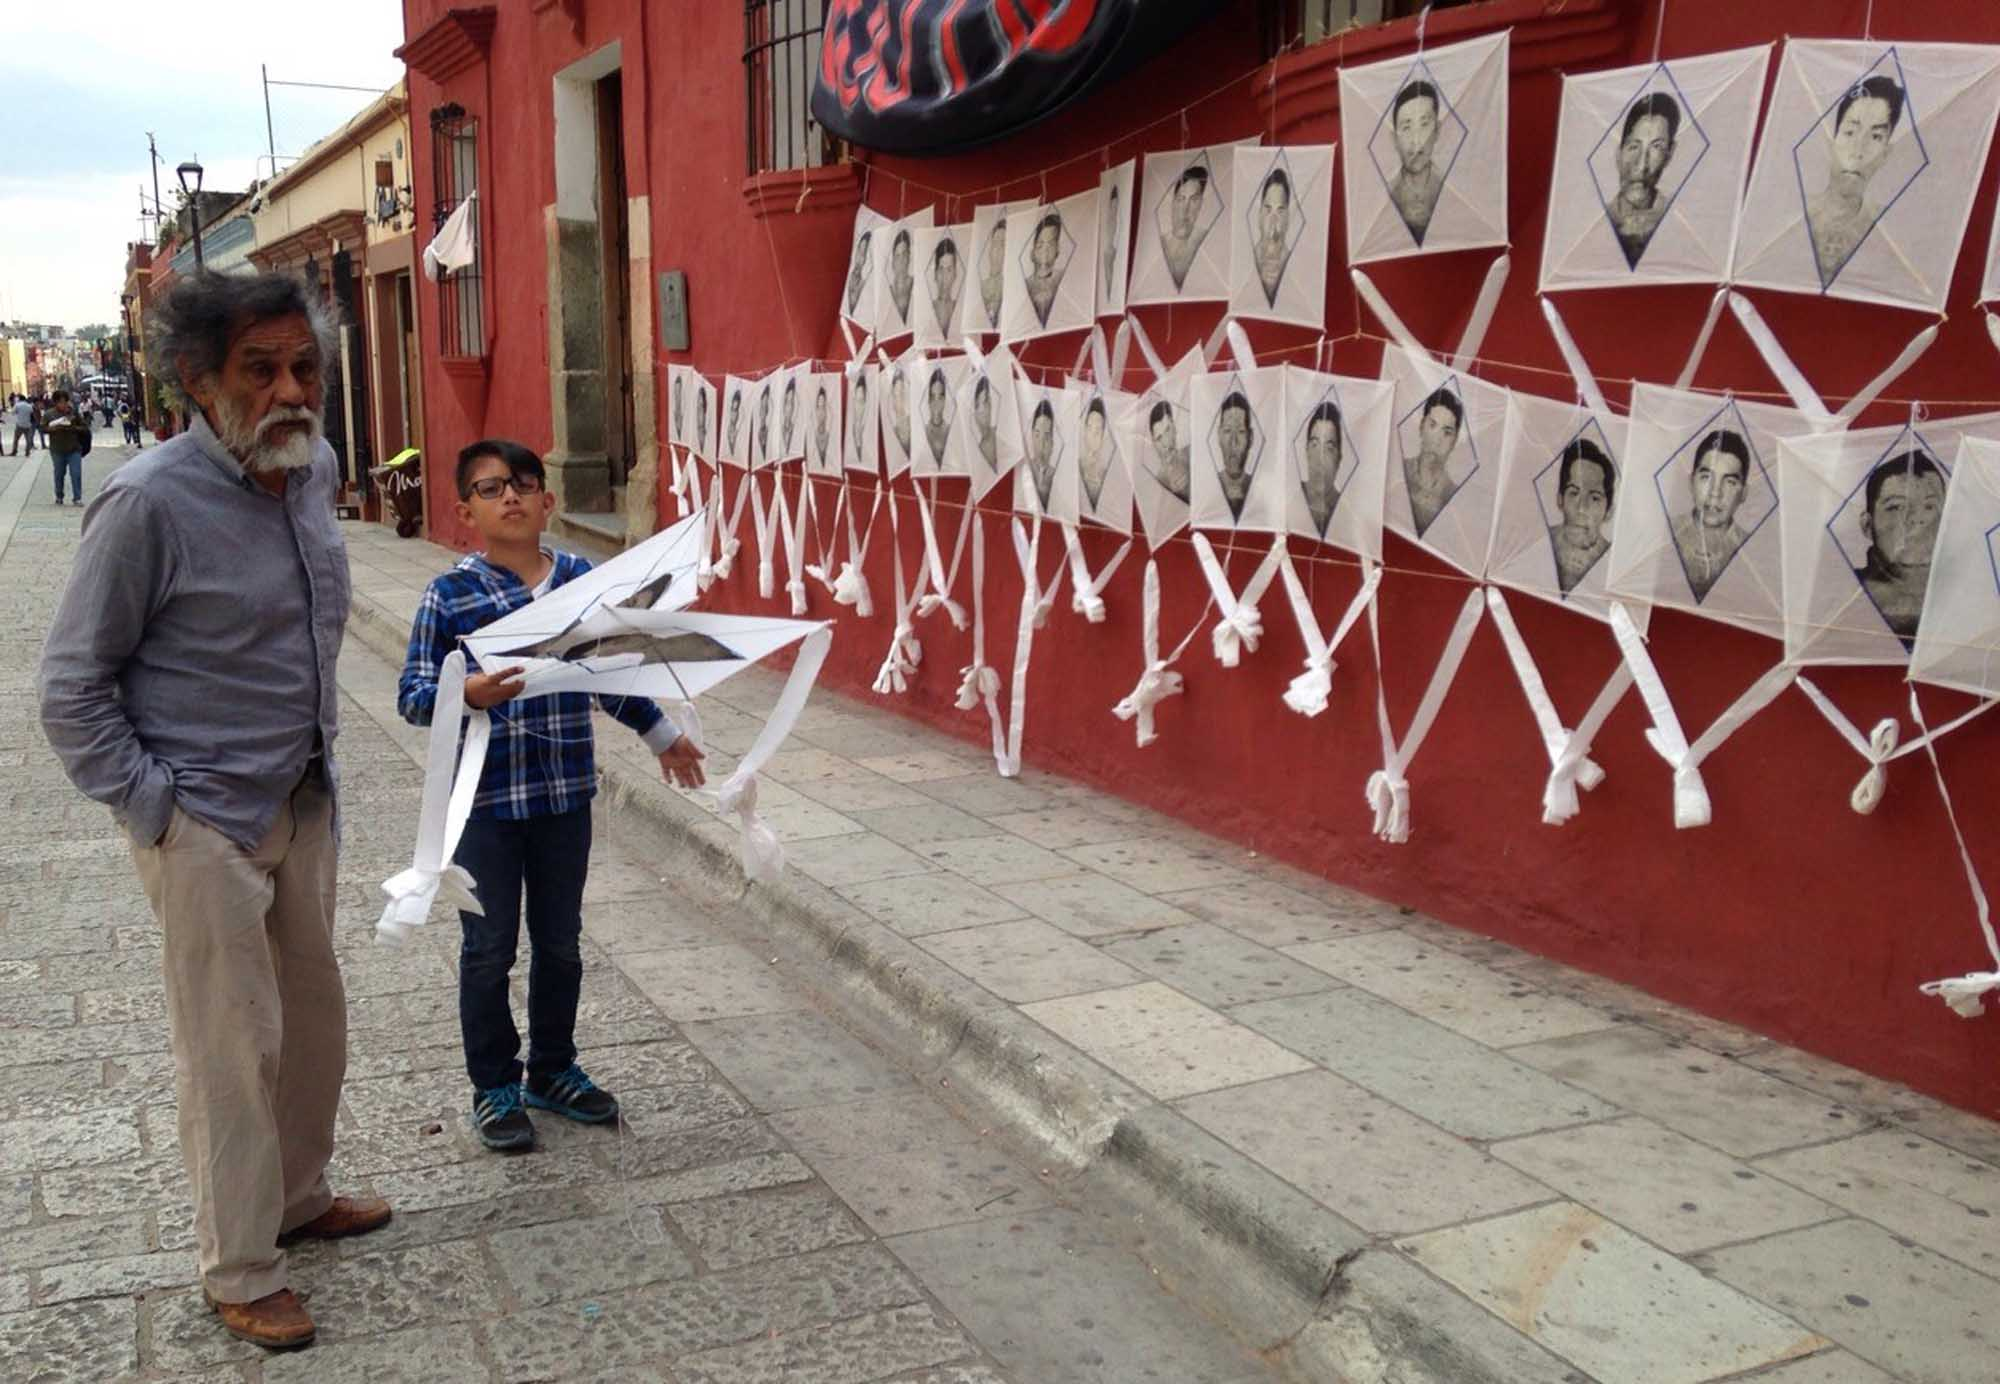 foto: Oaxaca Media / JLP